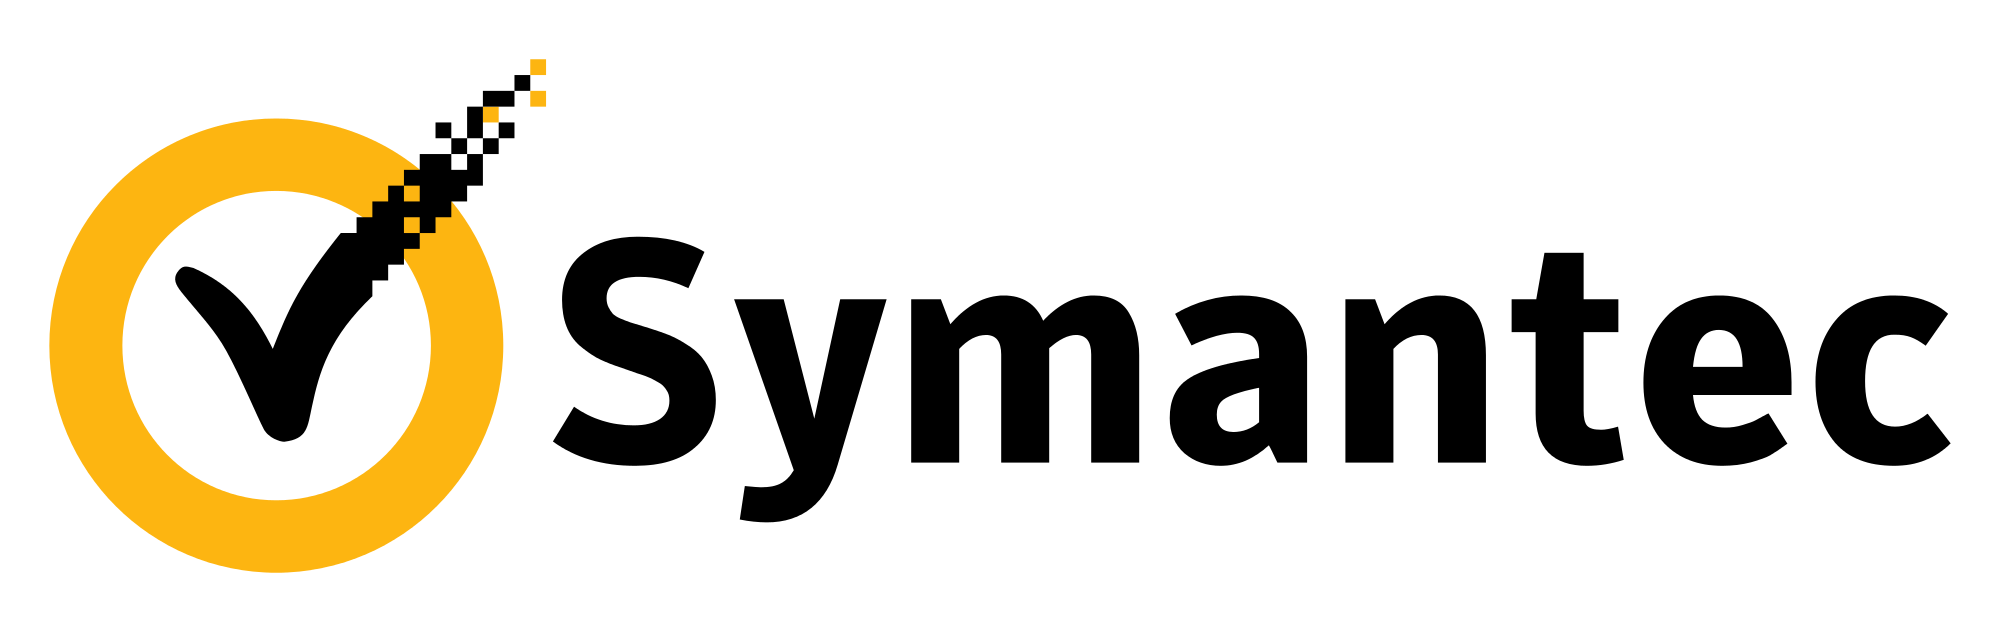 Symantec Web & Cloud Security logo